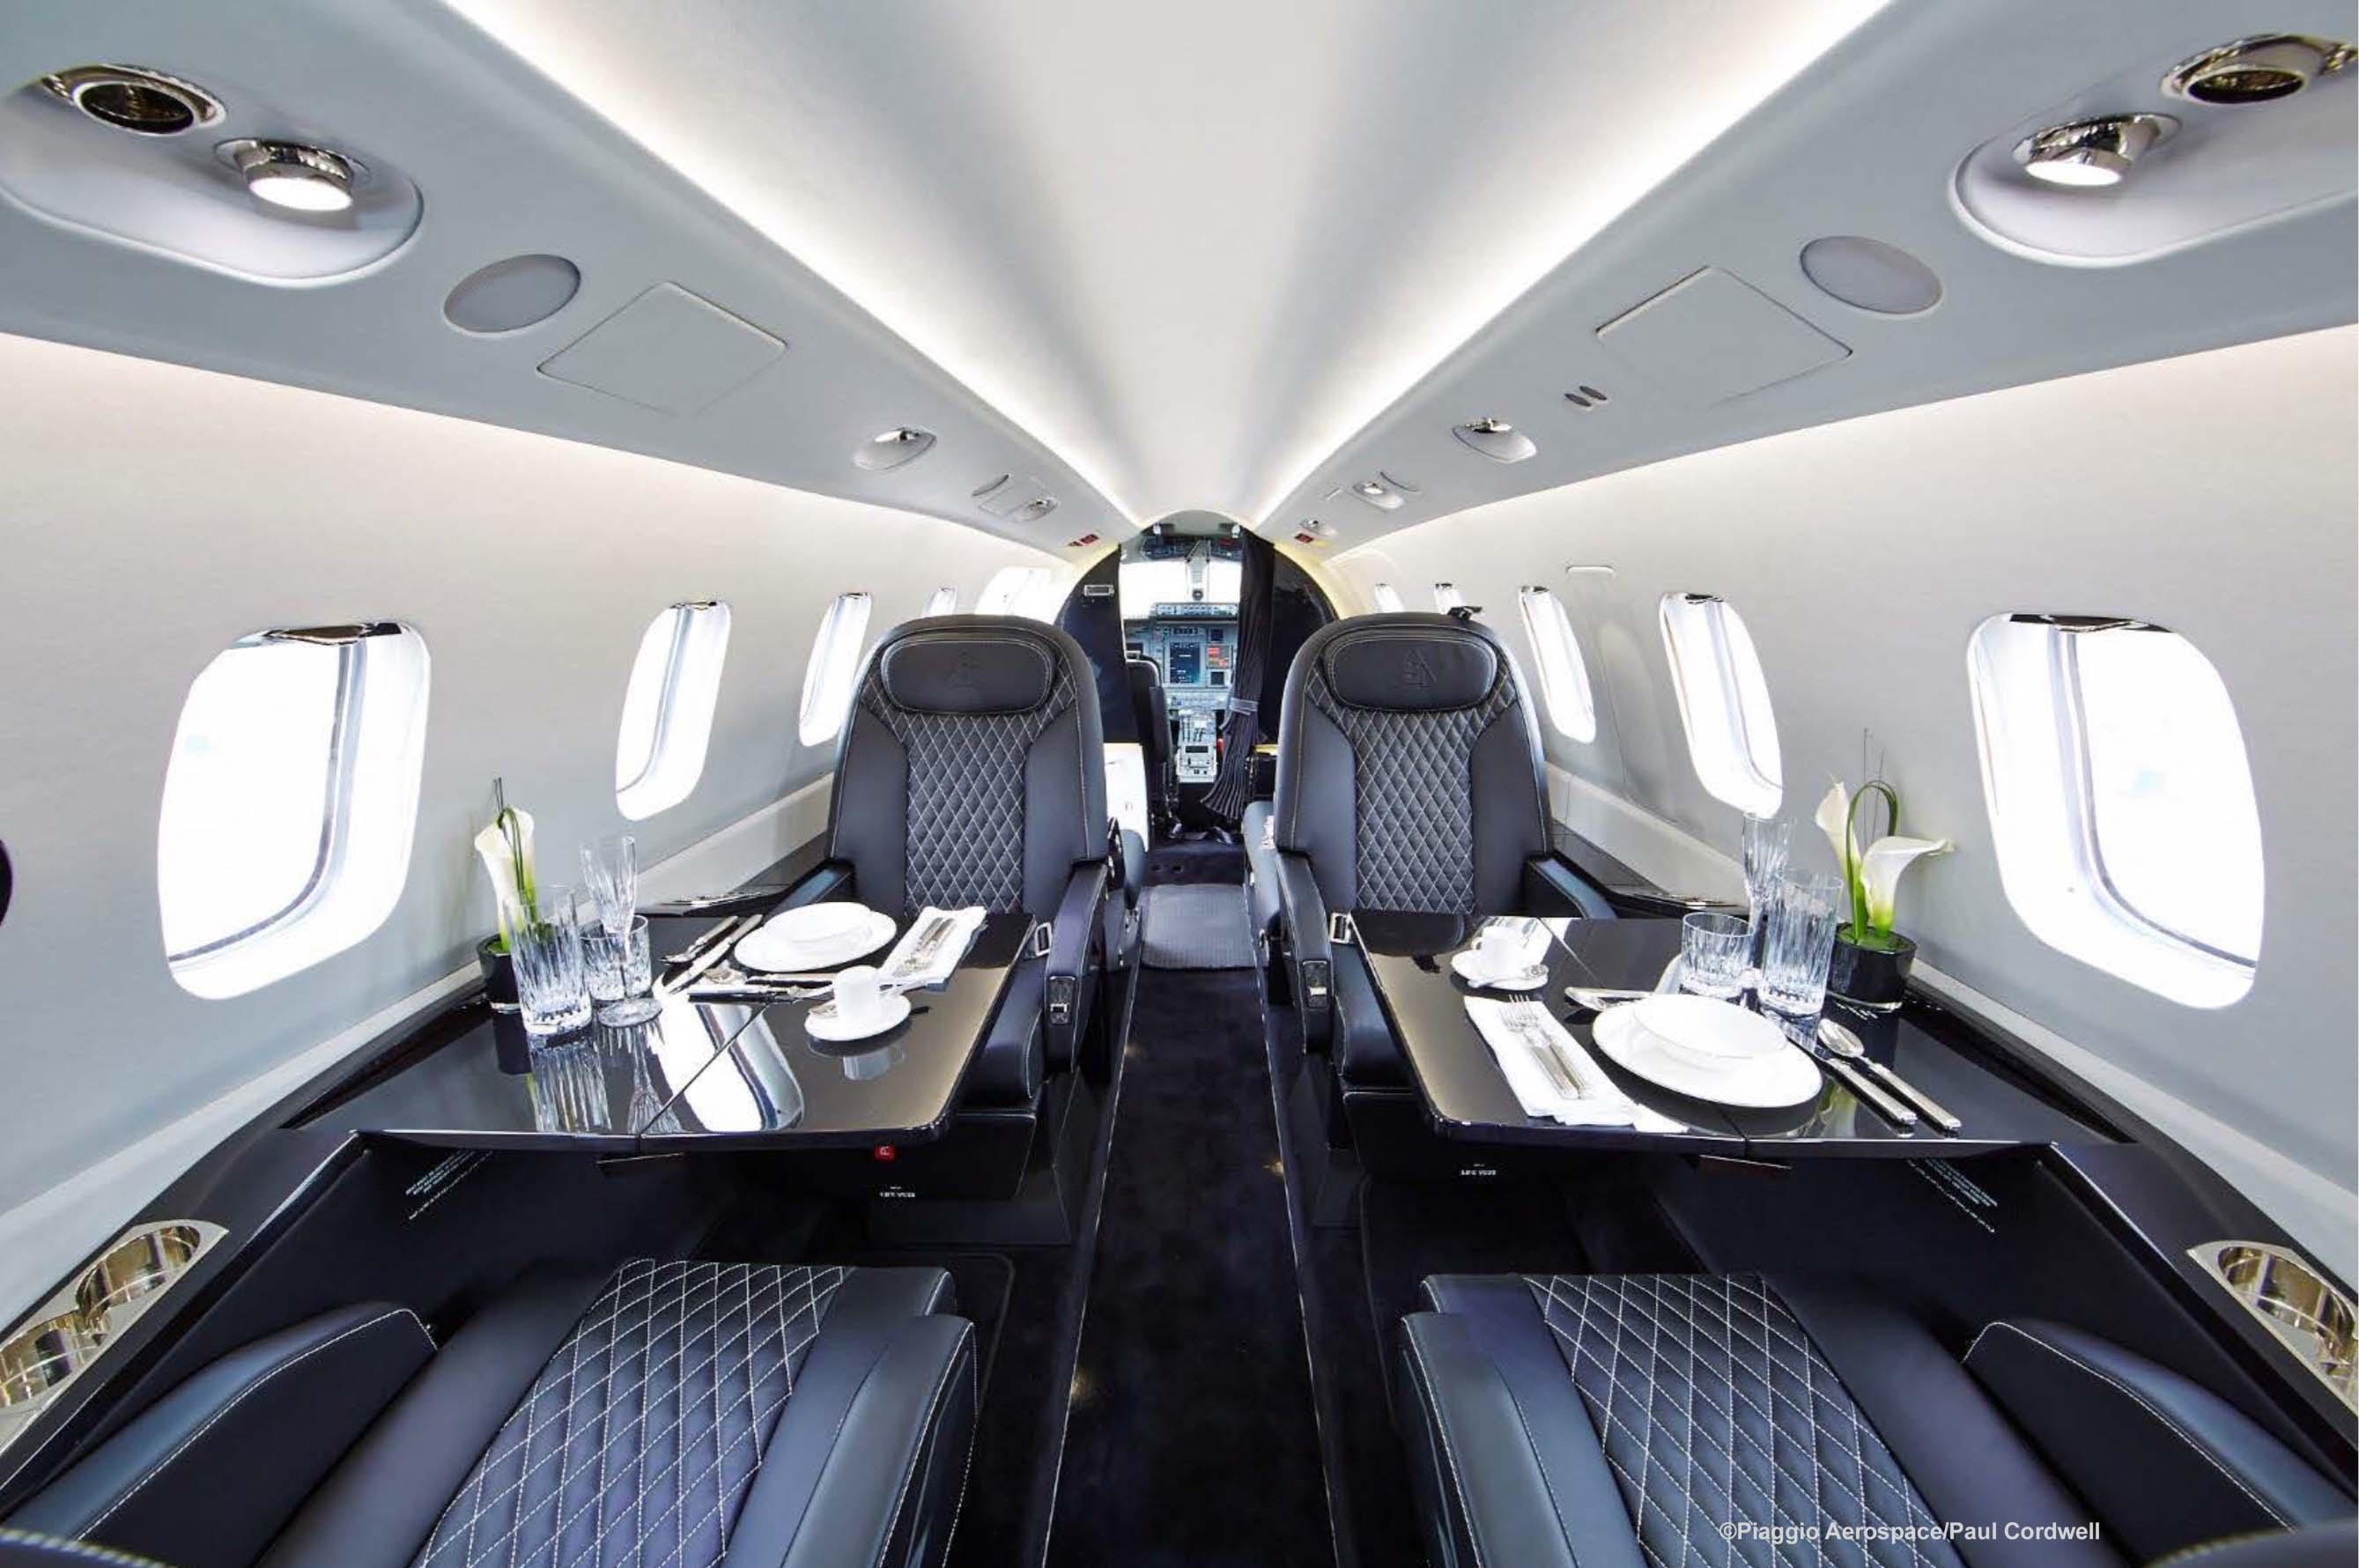 Interior 1LR Paul Cordwell - Итальянский стиль  Piaggio Avanti II против американской практичности Beechcraft King Air 350i/350iER